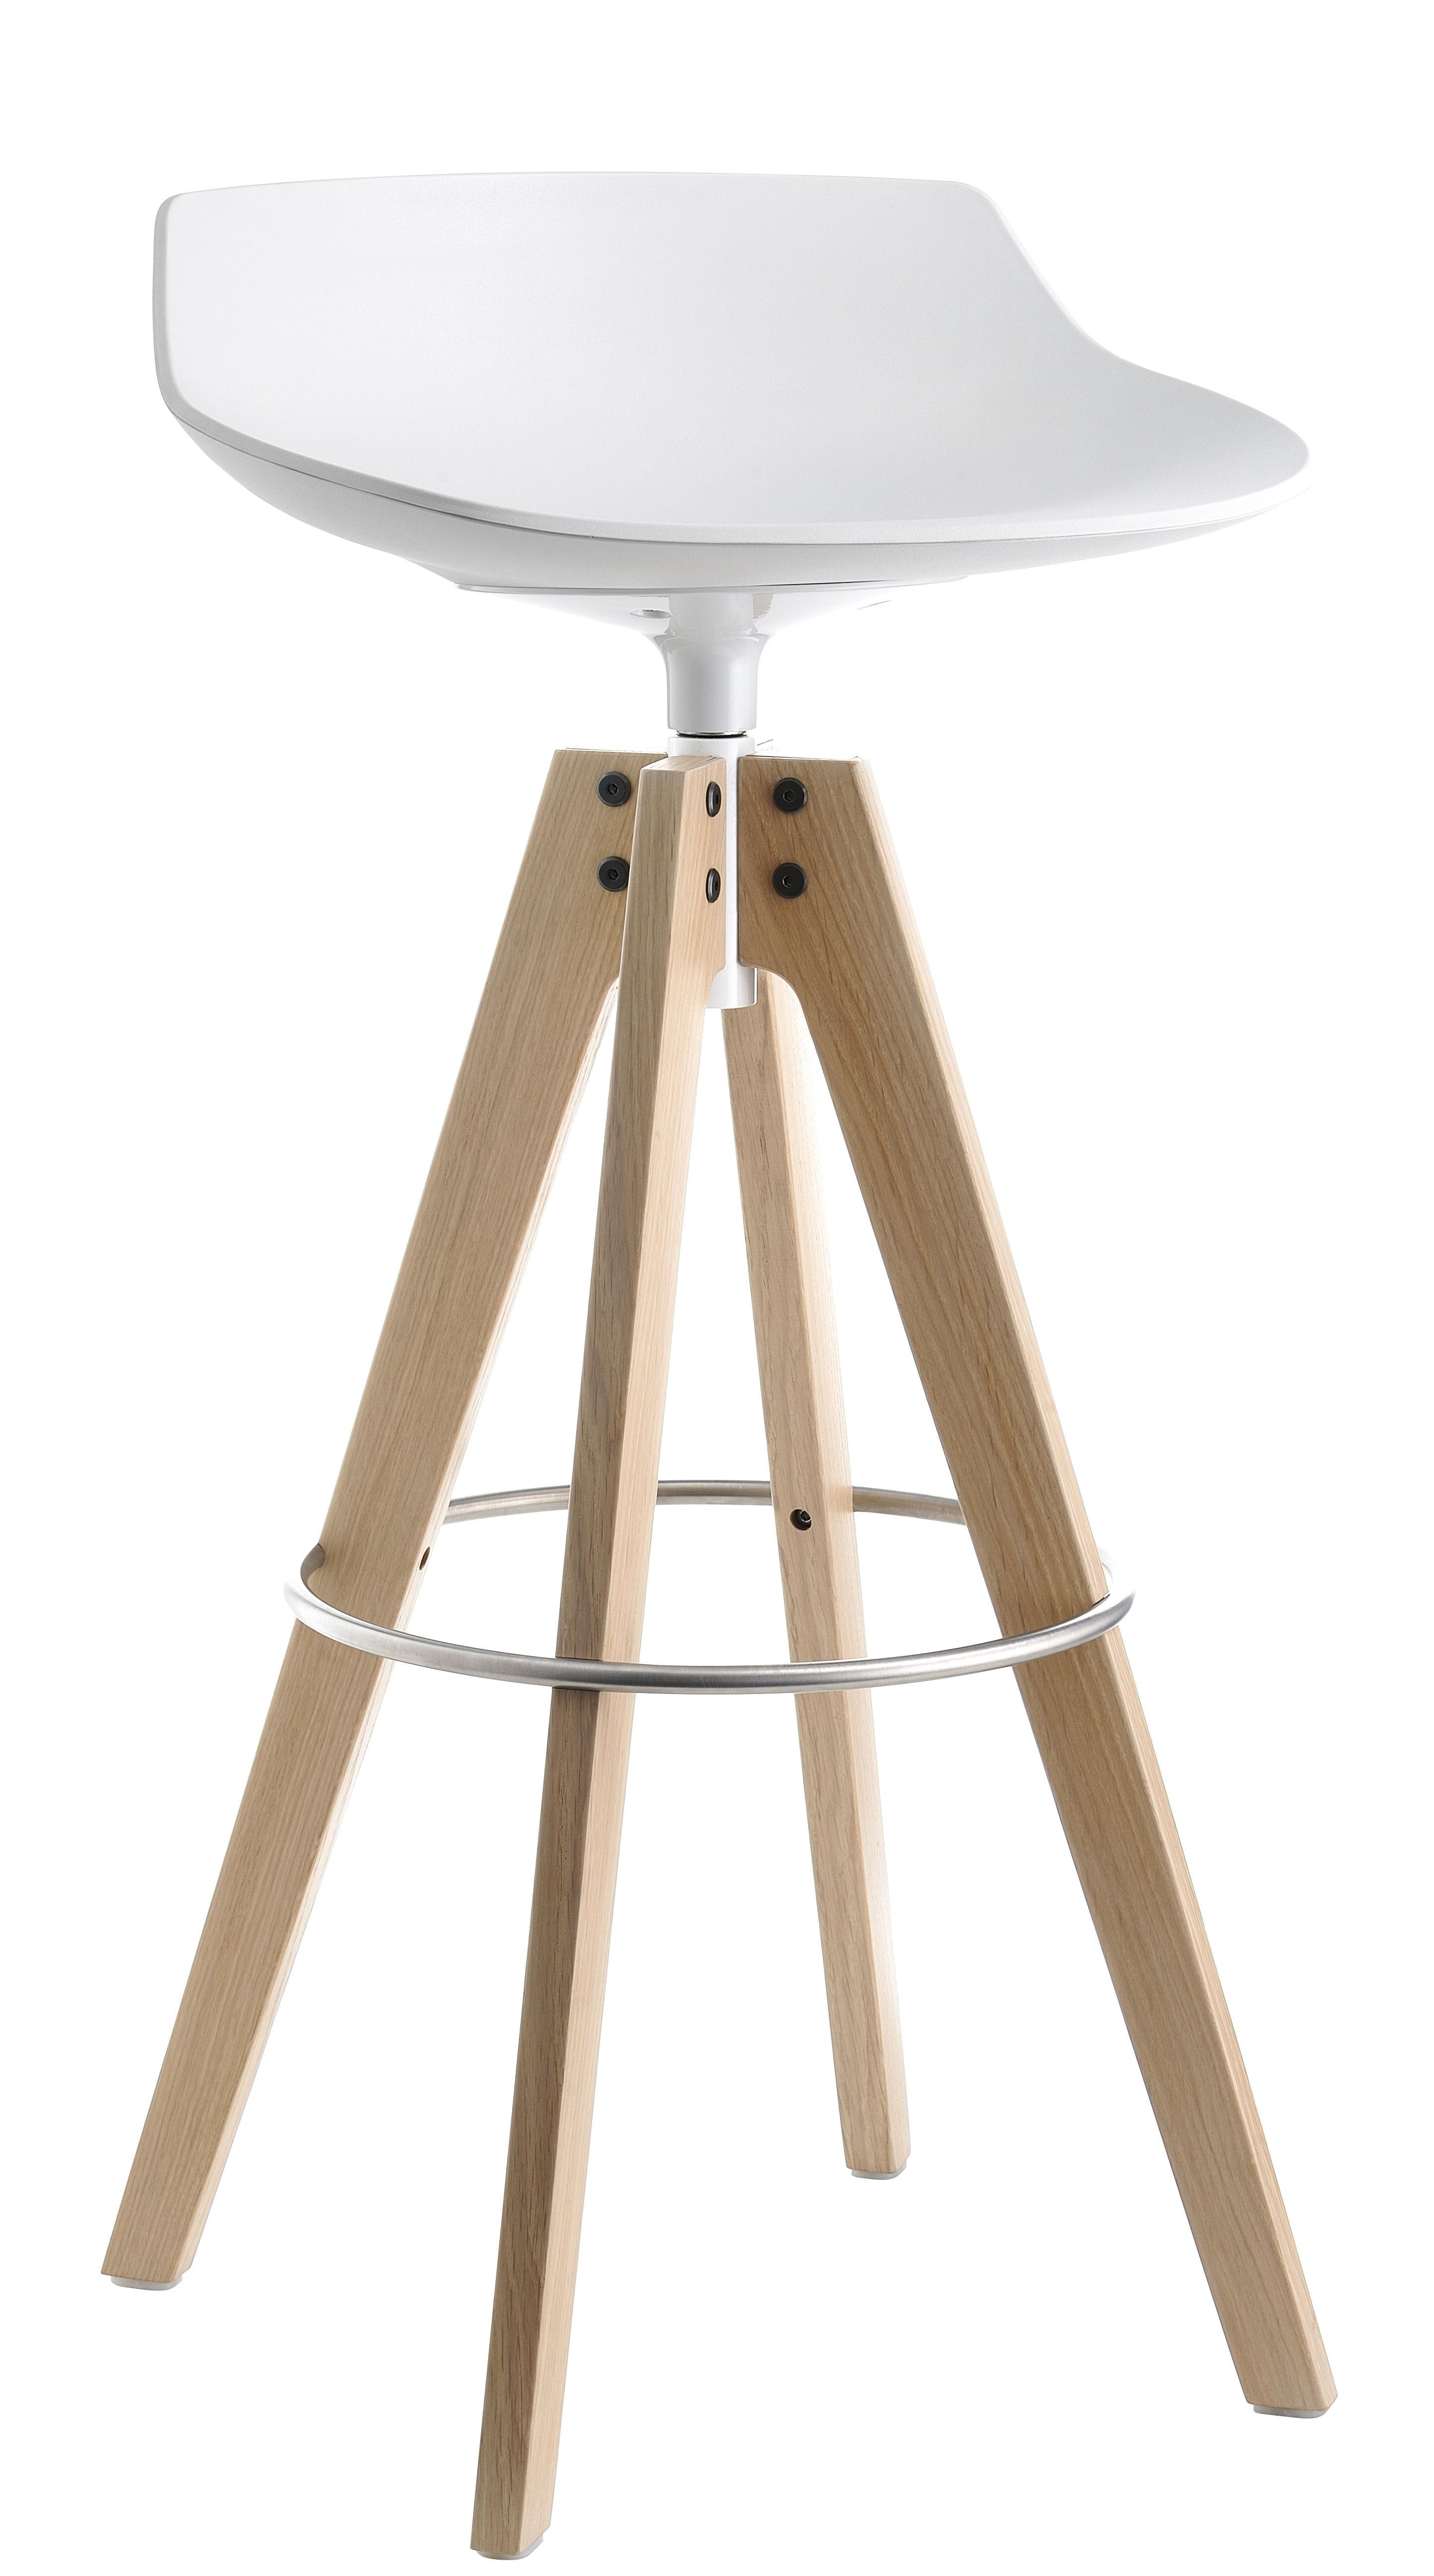 tabouret de bar flow h 78 cm pieds ch ne blanc pi tement ch ne naturel mdf italia. Black Bedroom Furniture Sets. Home Design Ideas